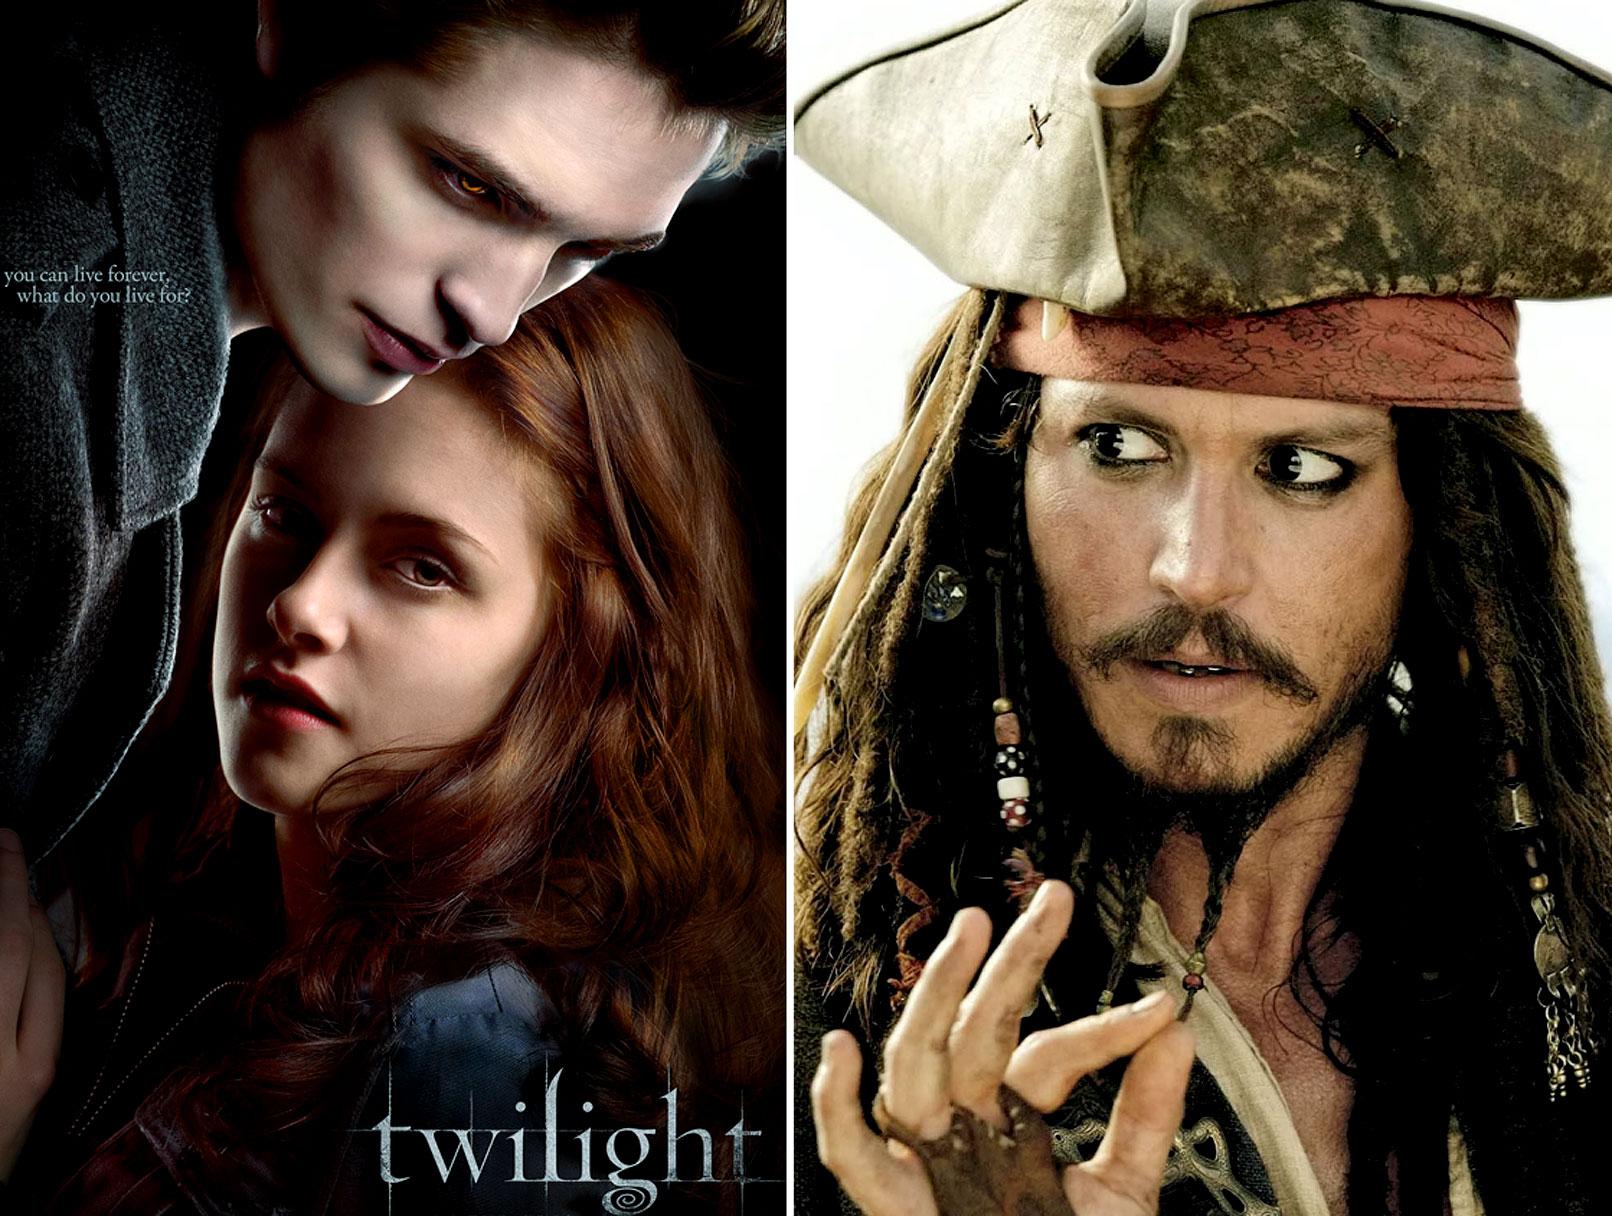 'Twilight' vs. 'Pirates': The DVD Wars